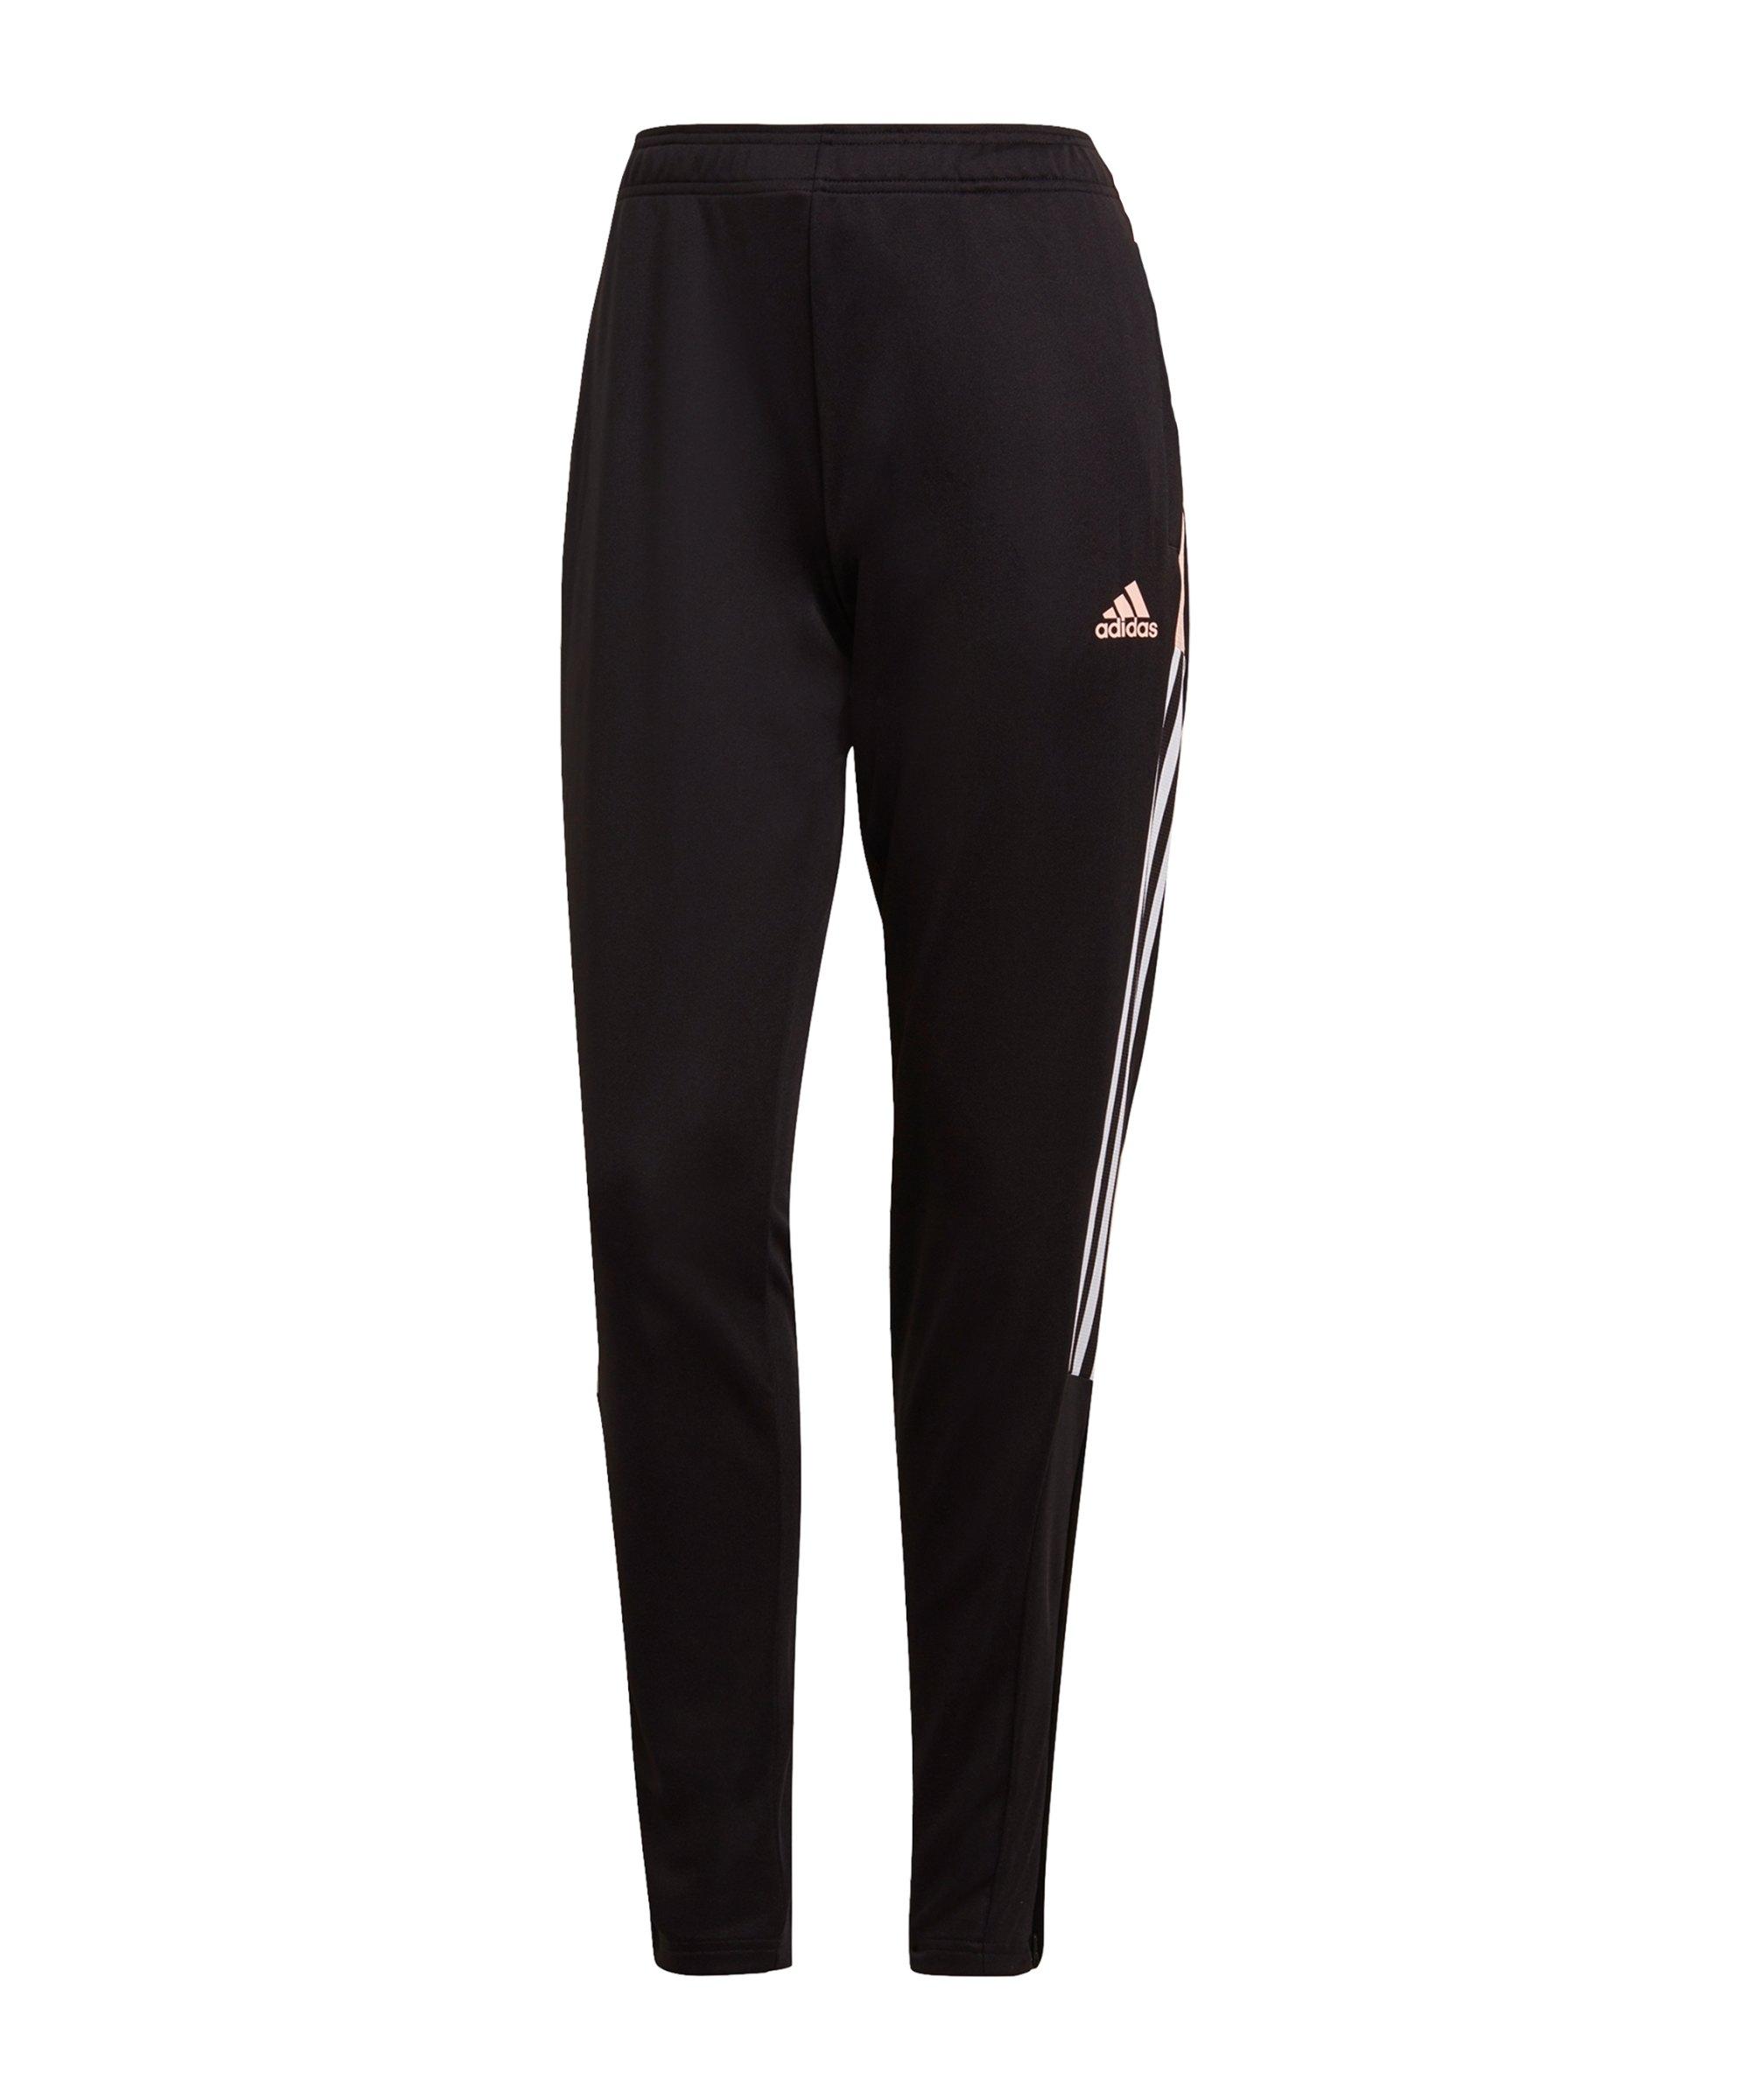 adidas Tiro Trainingshose Damen Schwarz Pink - schwarz